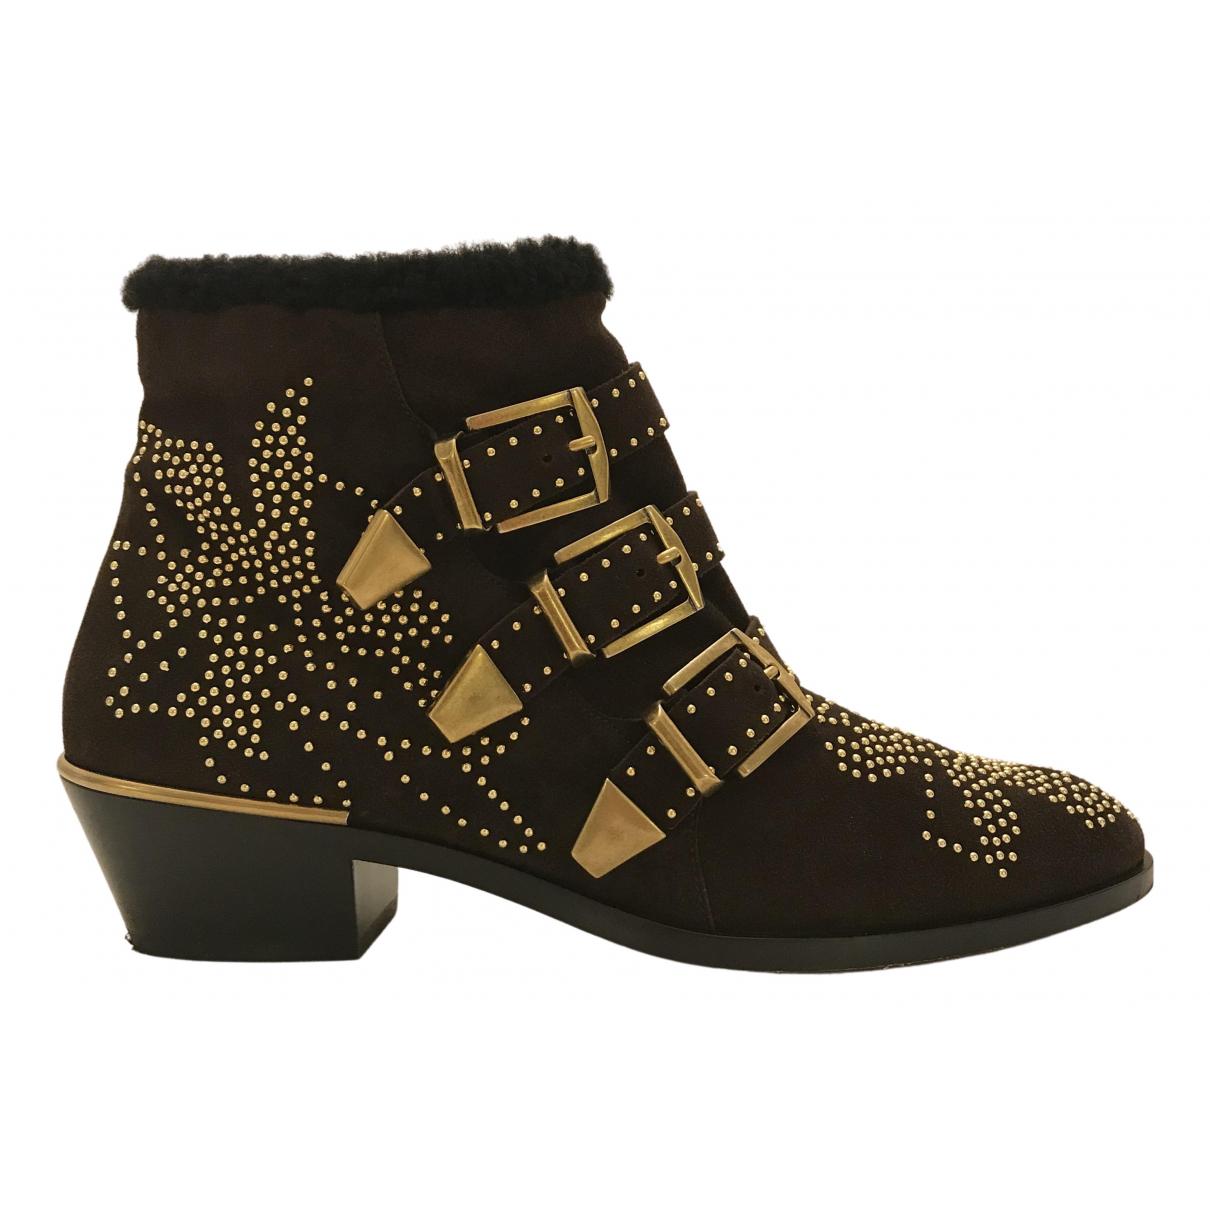 Chloé Susanna Brown Suede Ankle boots for Women 38 EU